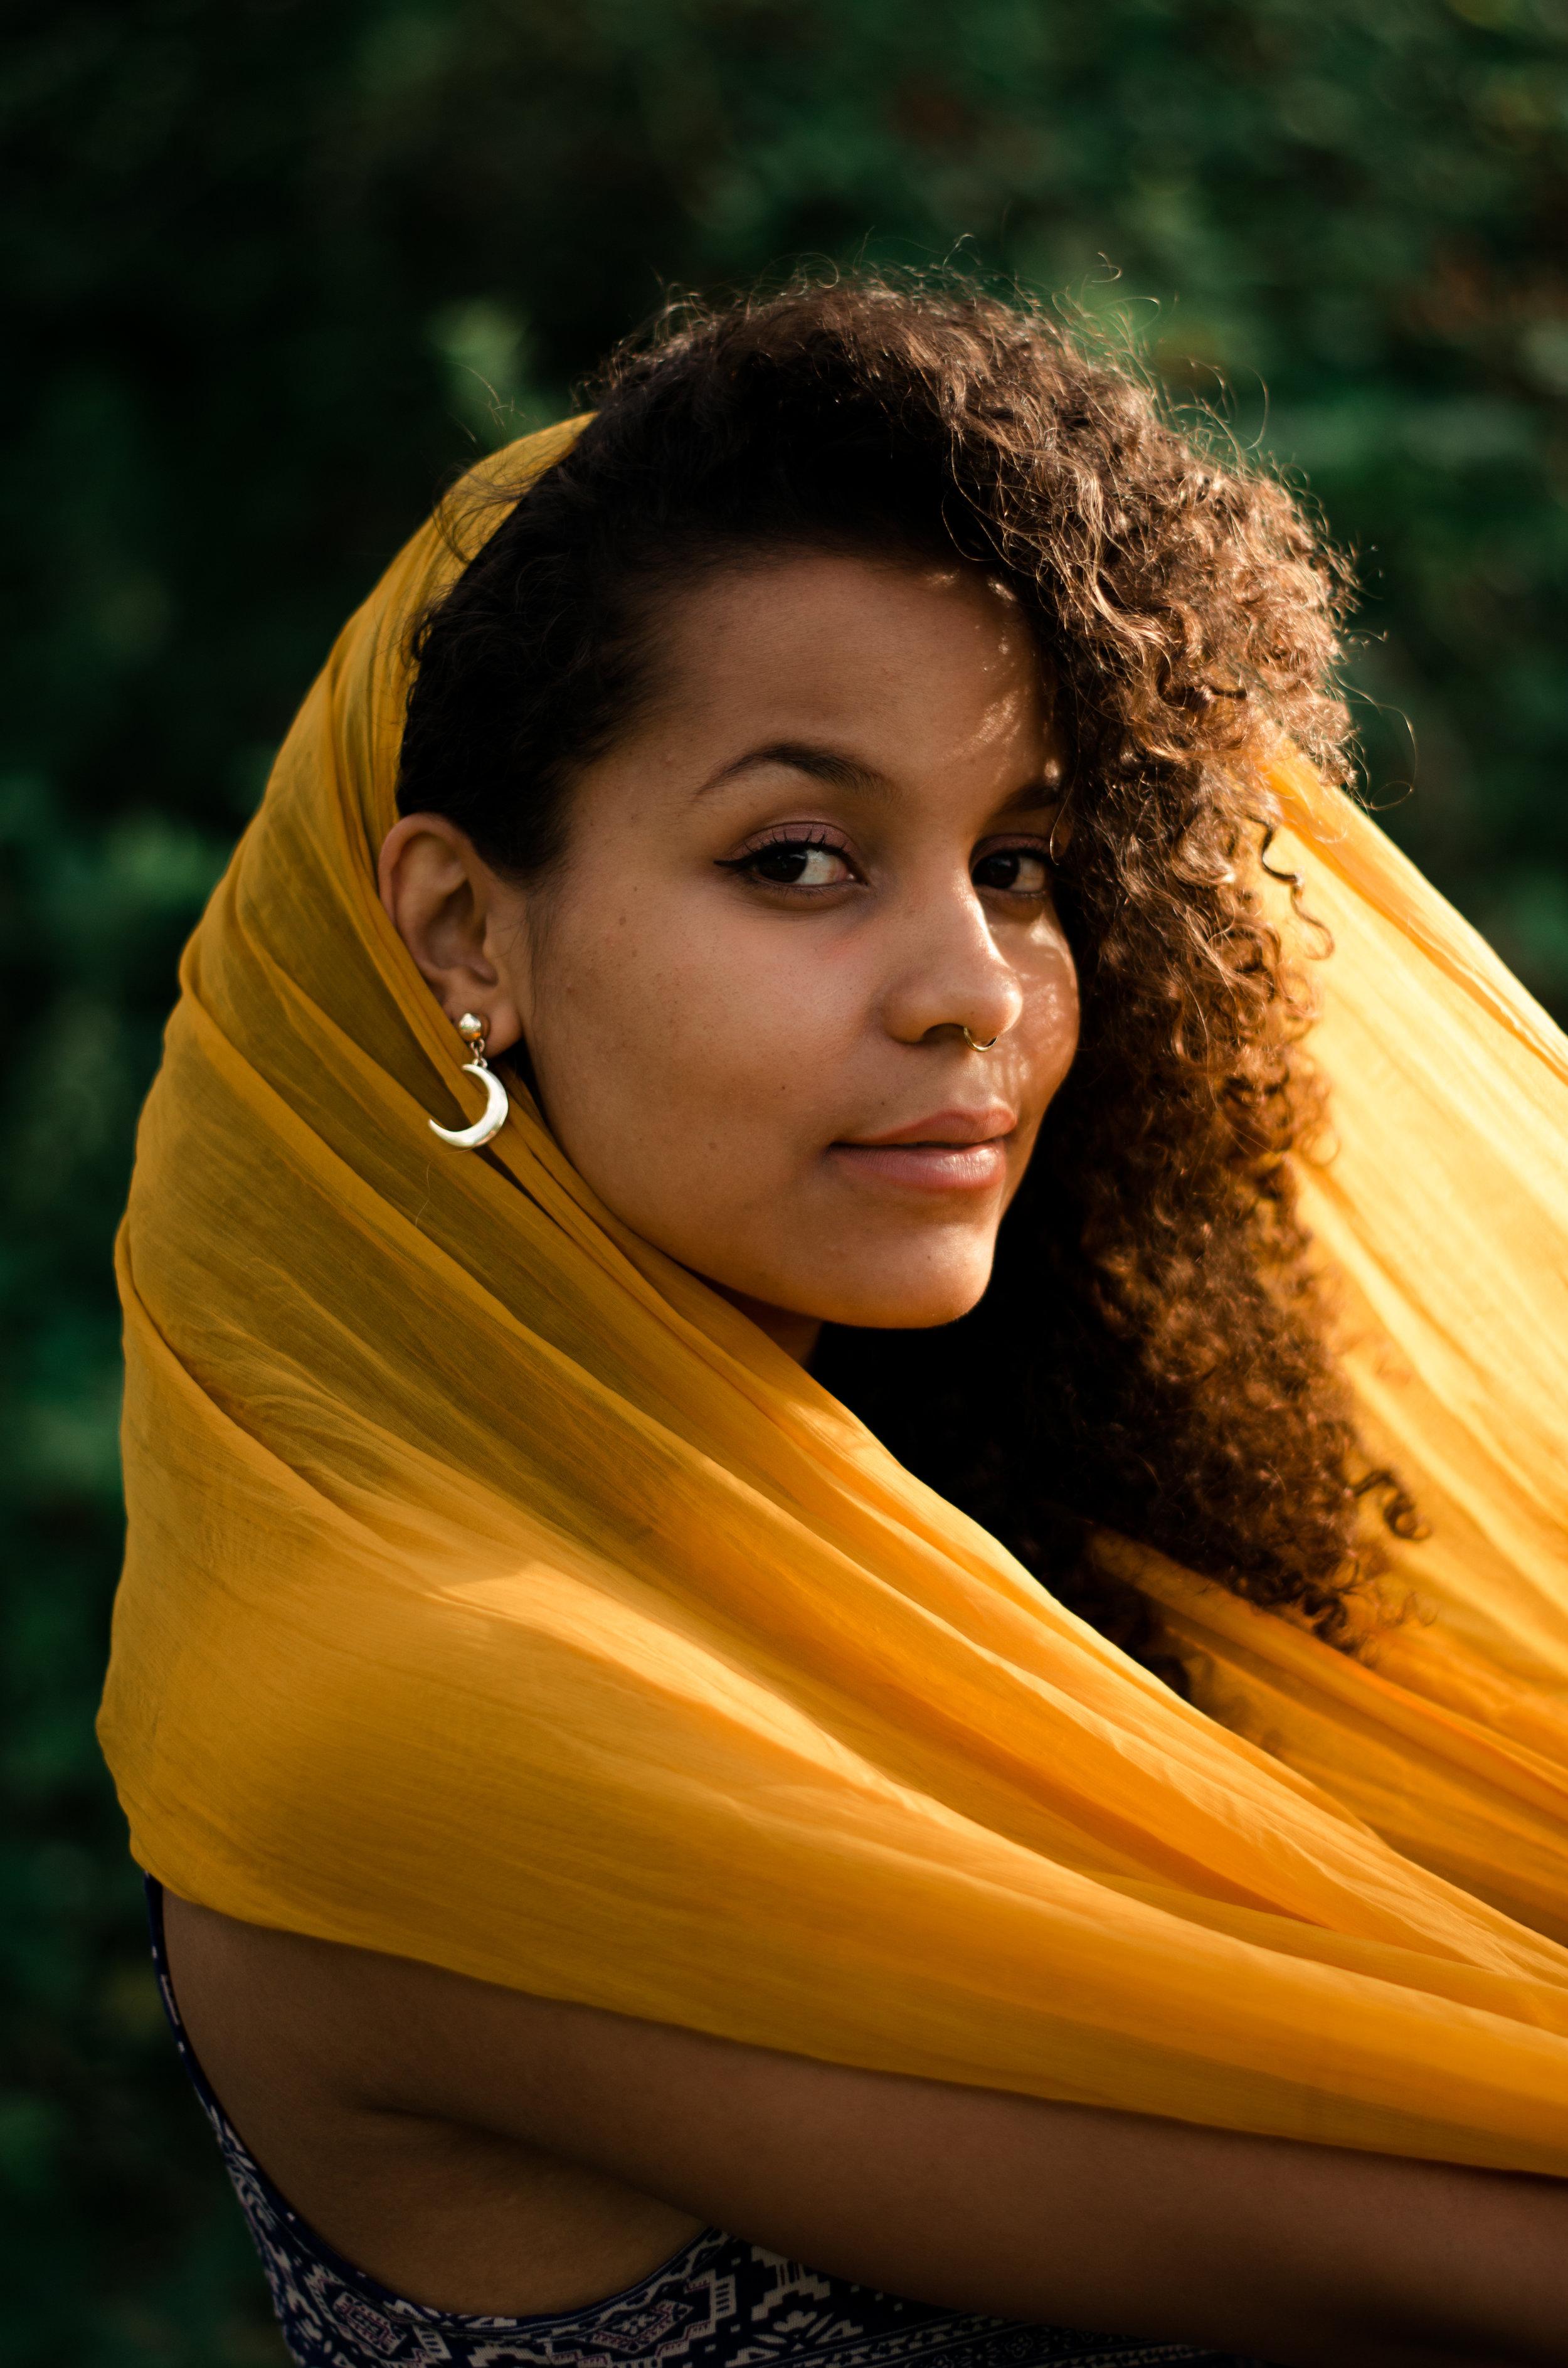 Inka-Portrait-Session-Aiste-Saulyte-Photography-17-07-30-35.jpg